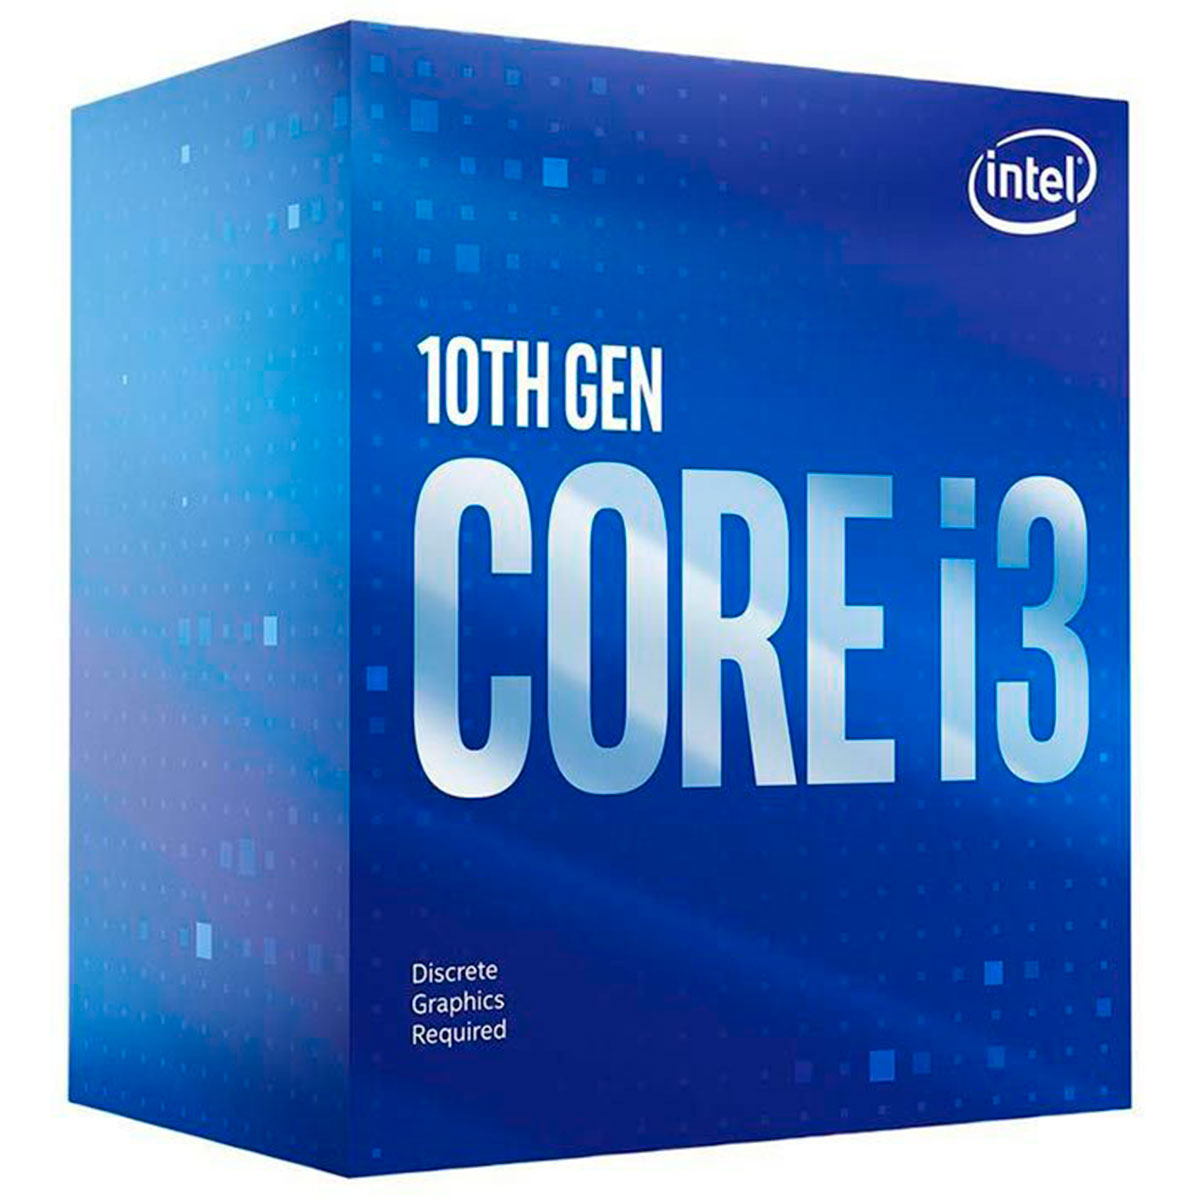 Kit Upgrade Optimize Basic, Asus Prime H410M-E, Intel Core I3-10100F 3.6GHz, 8GB DDR4 2666MHz